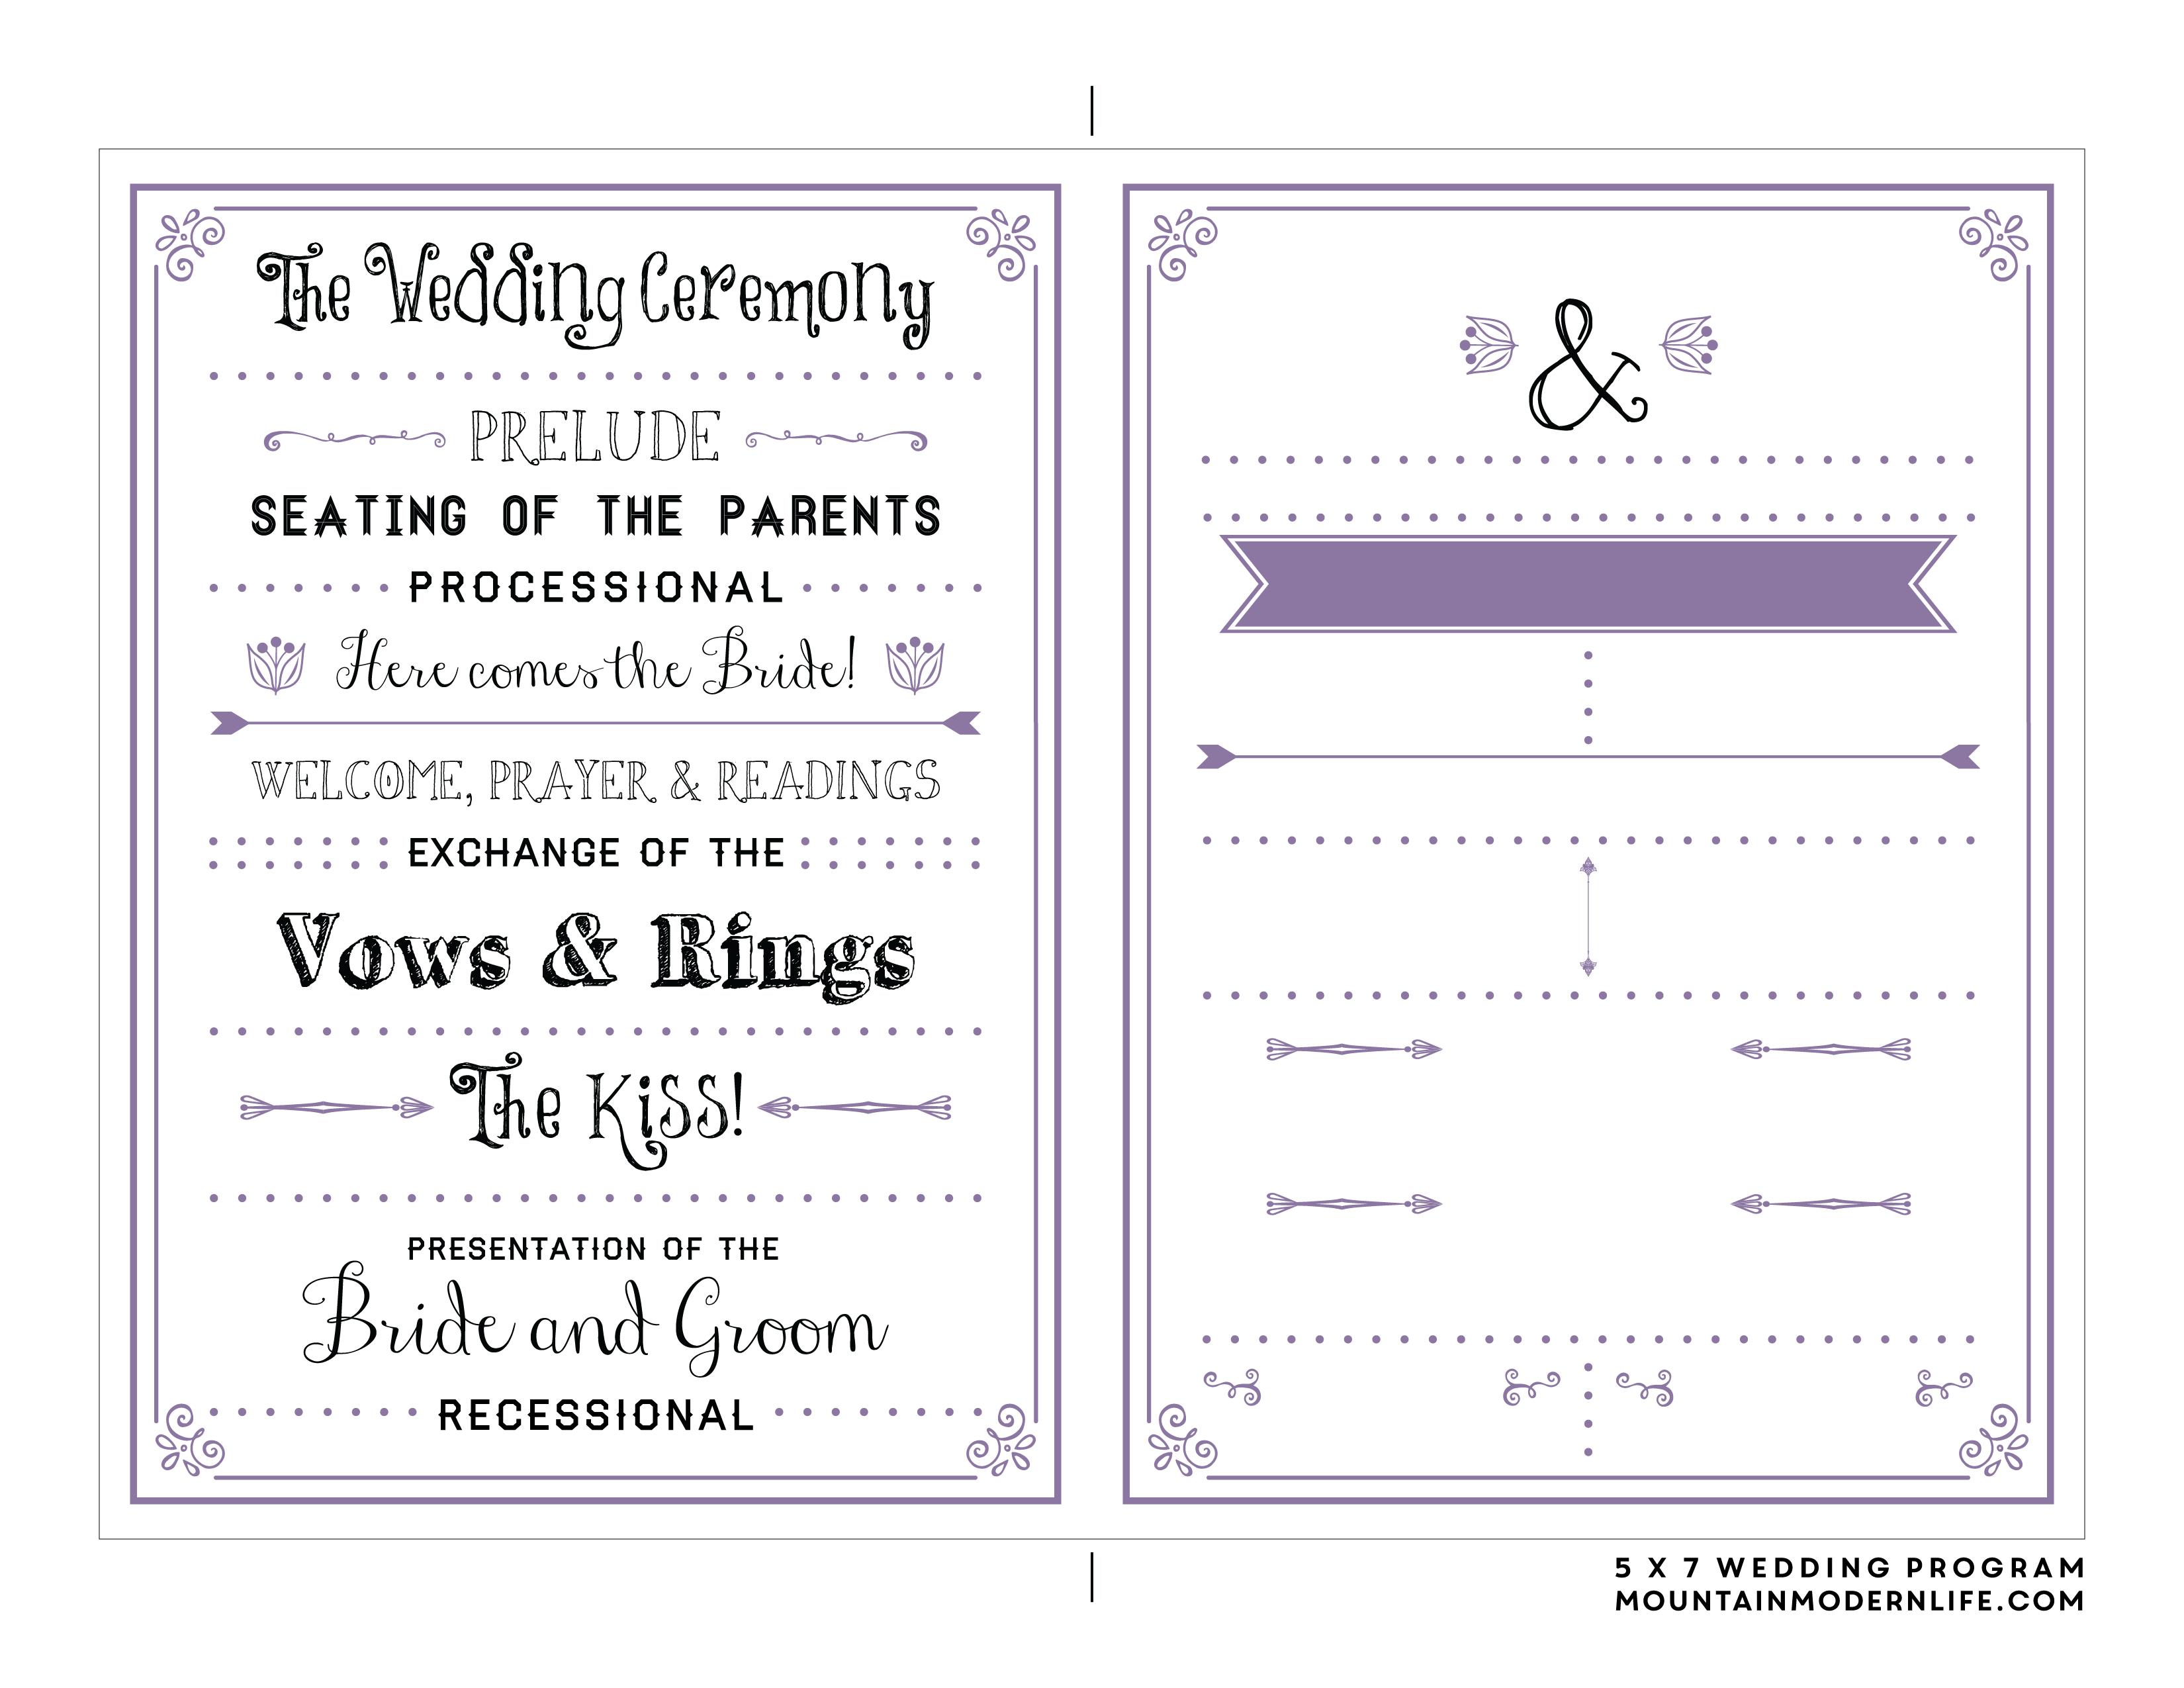 Free Printable Wedding Program | Mountainmodernlife - Free Printable Wedding Program Templates